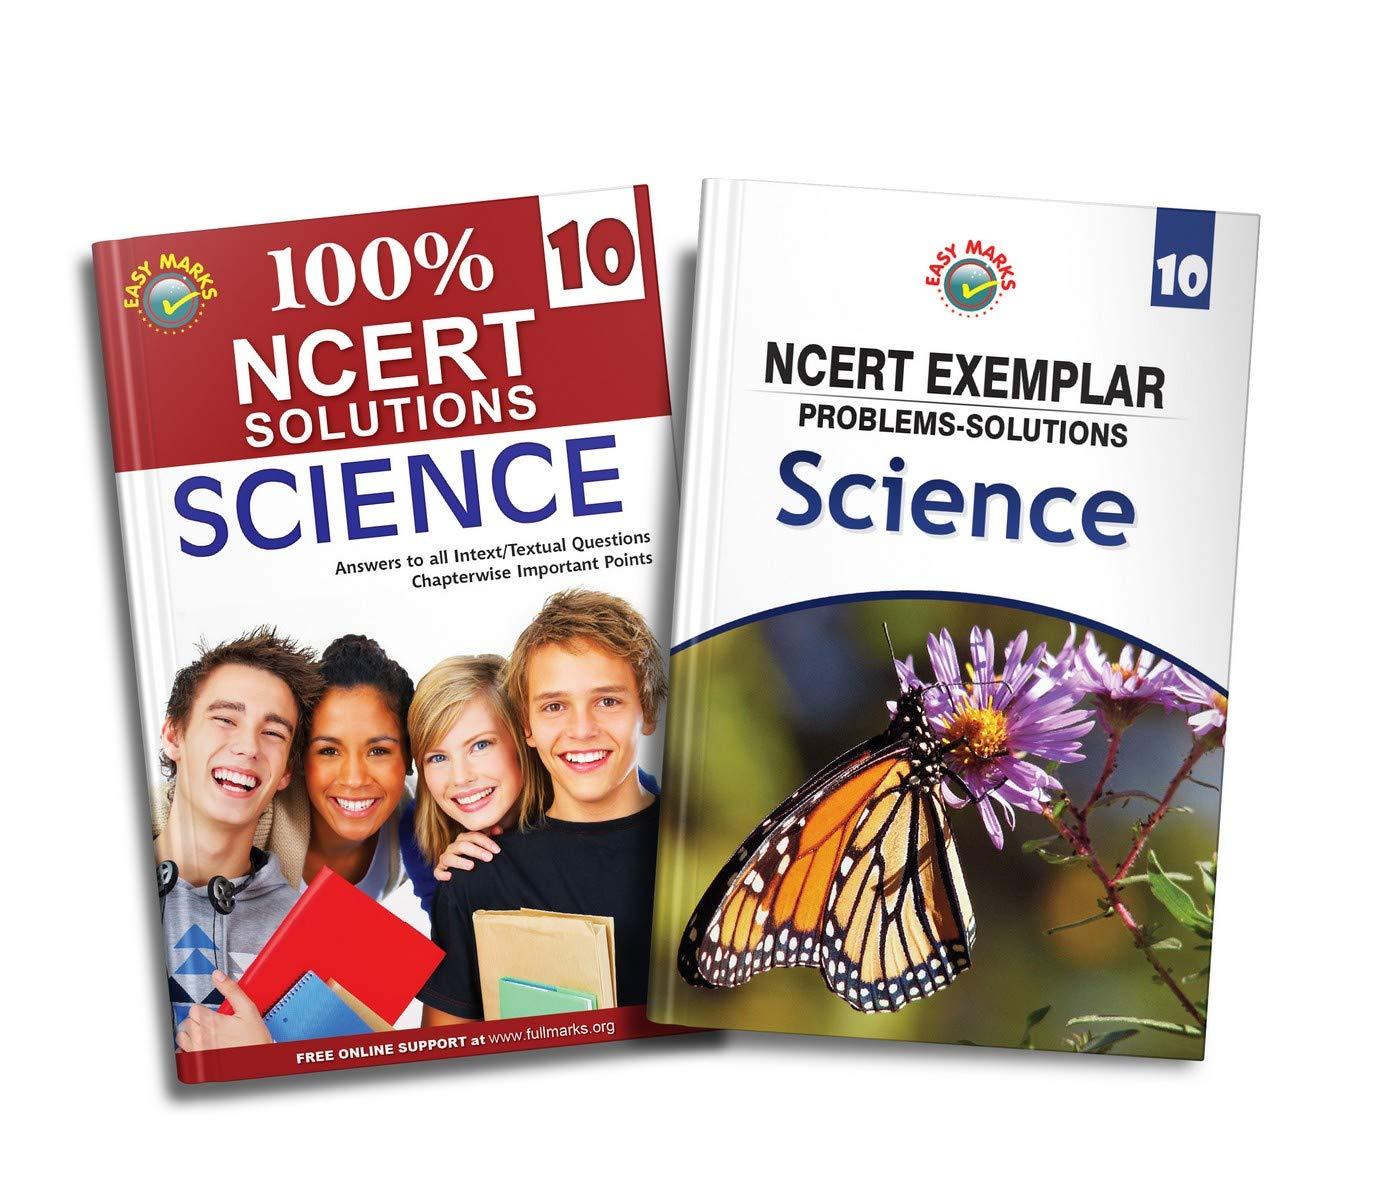 EASY Marks NCERT Solution & NCERT Exemplar Problems - Solutions